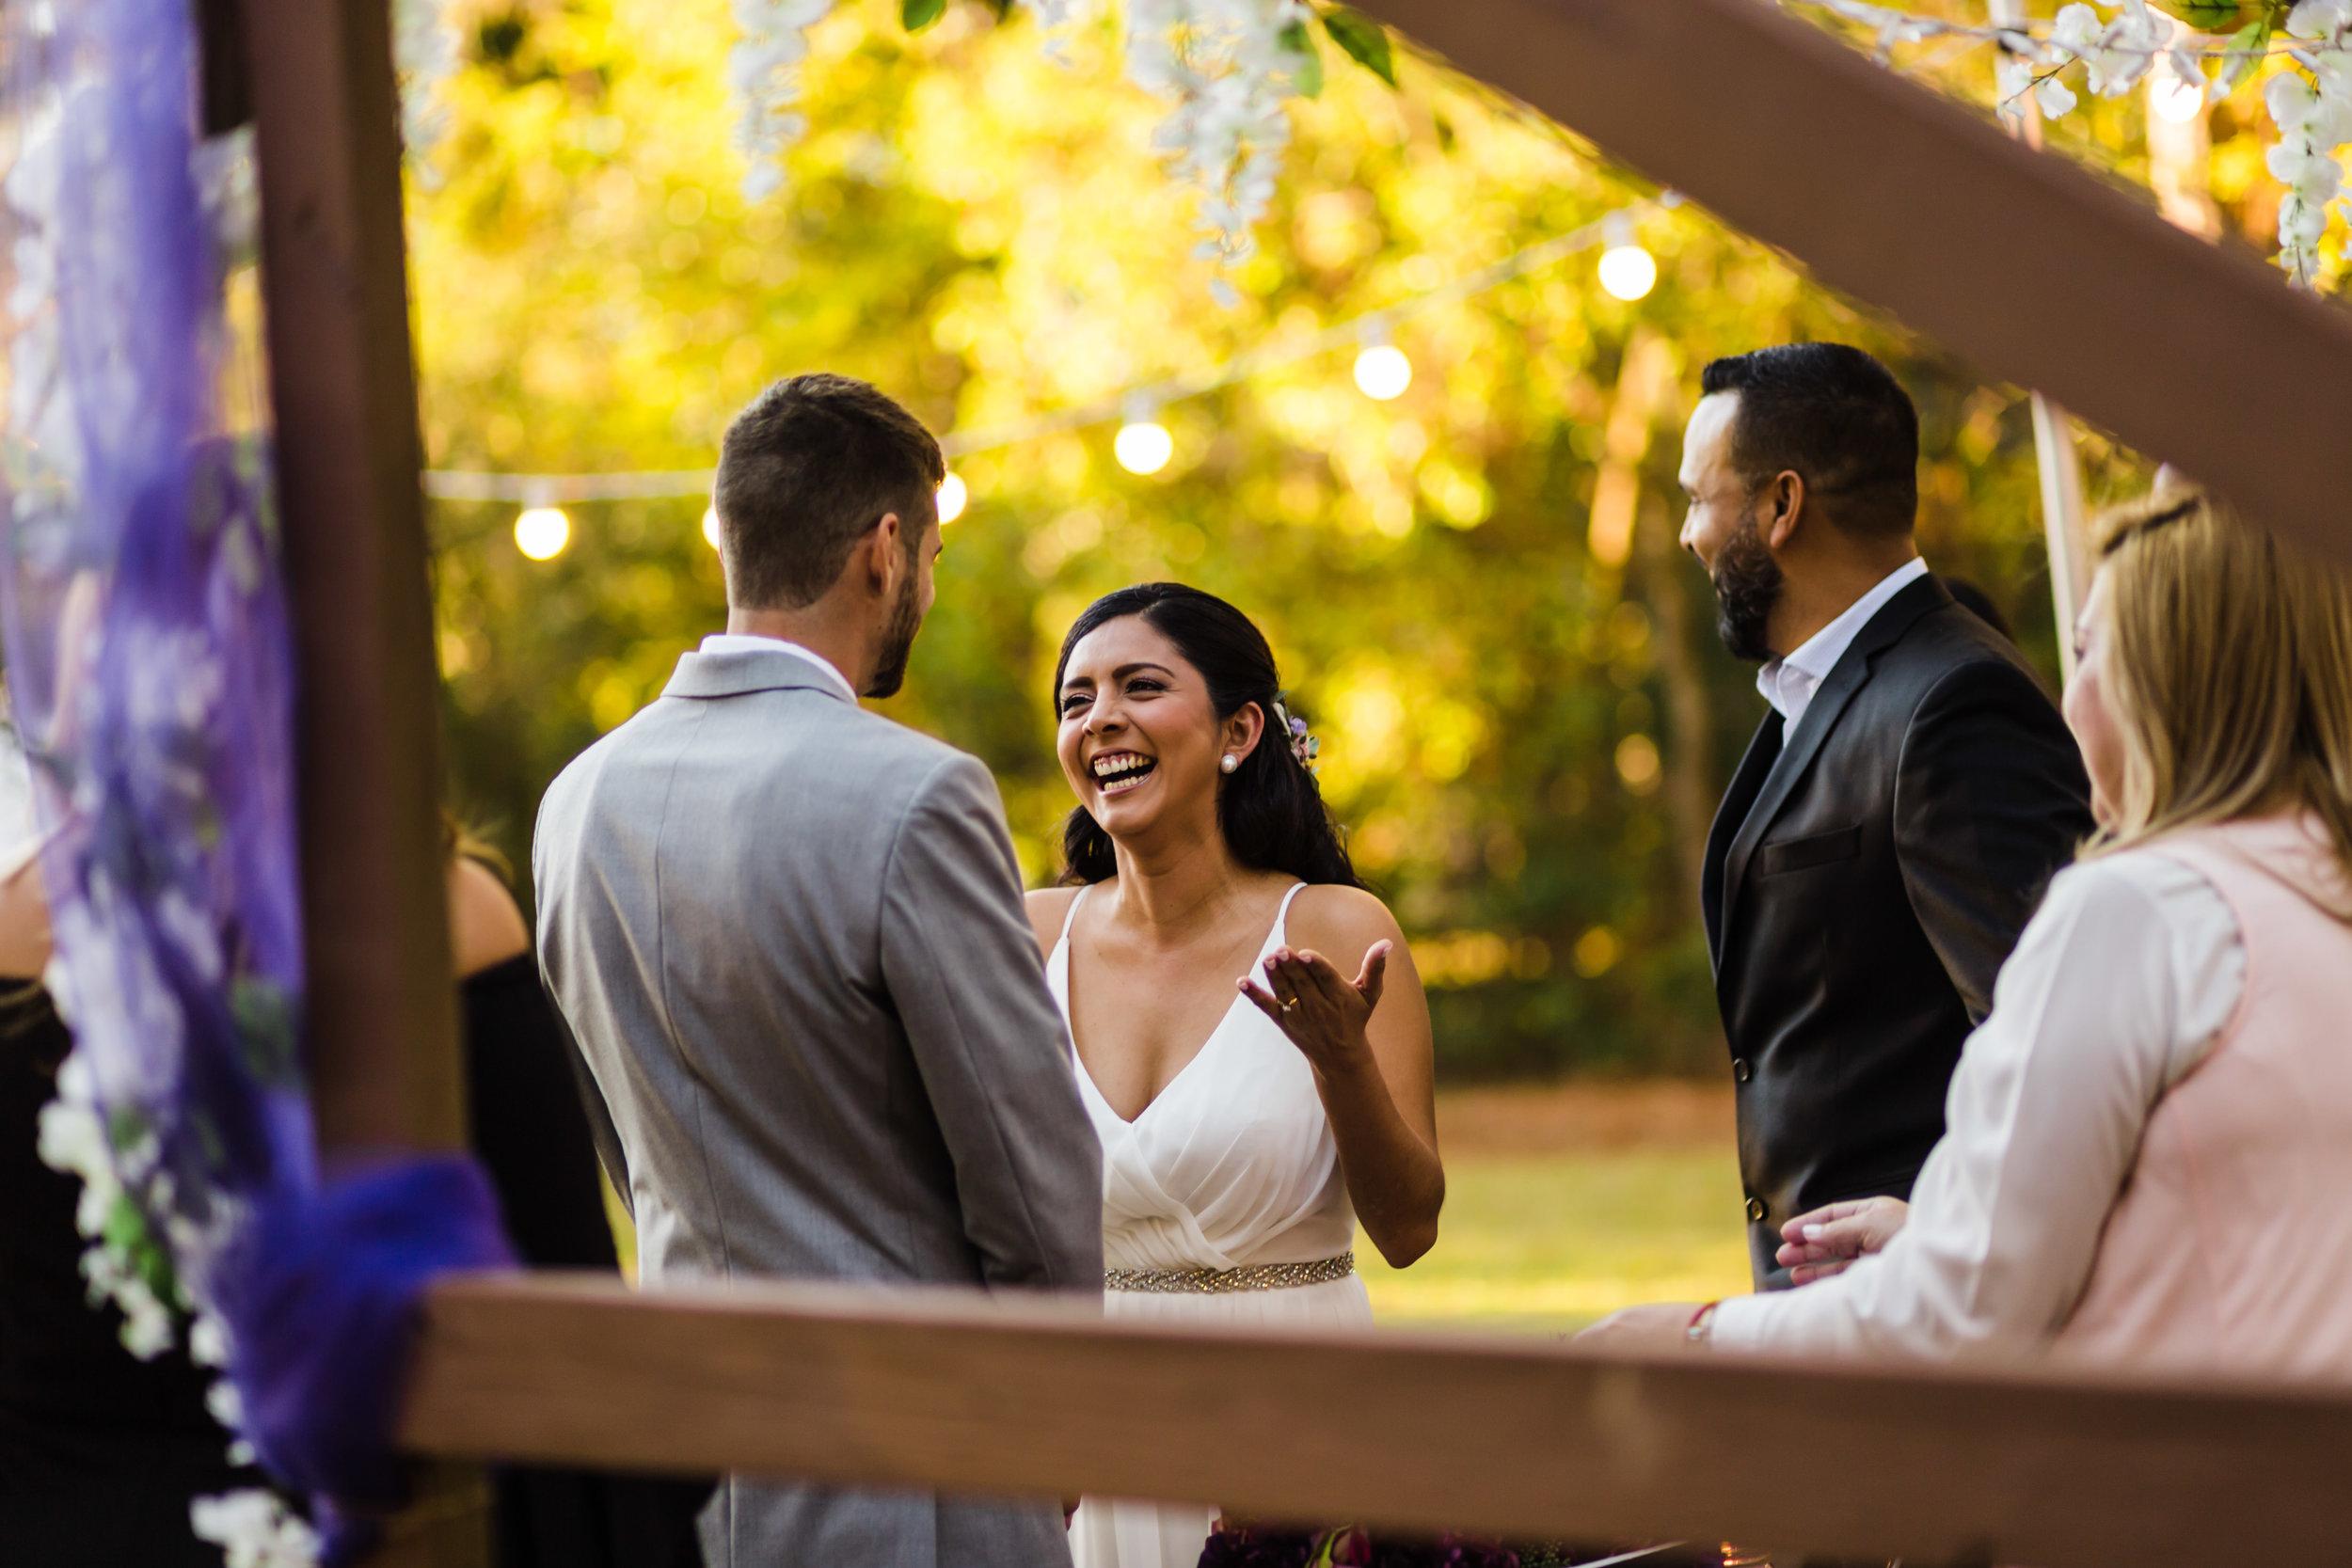 2018.11.03 Jael and Edel Ocala Wedding FINALS (218 of 441).jpg